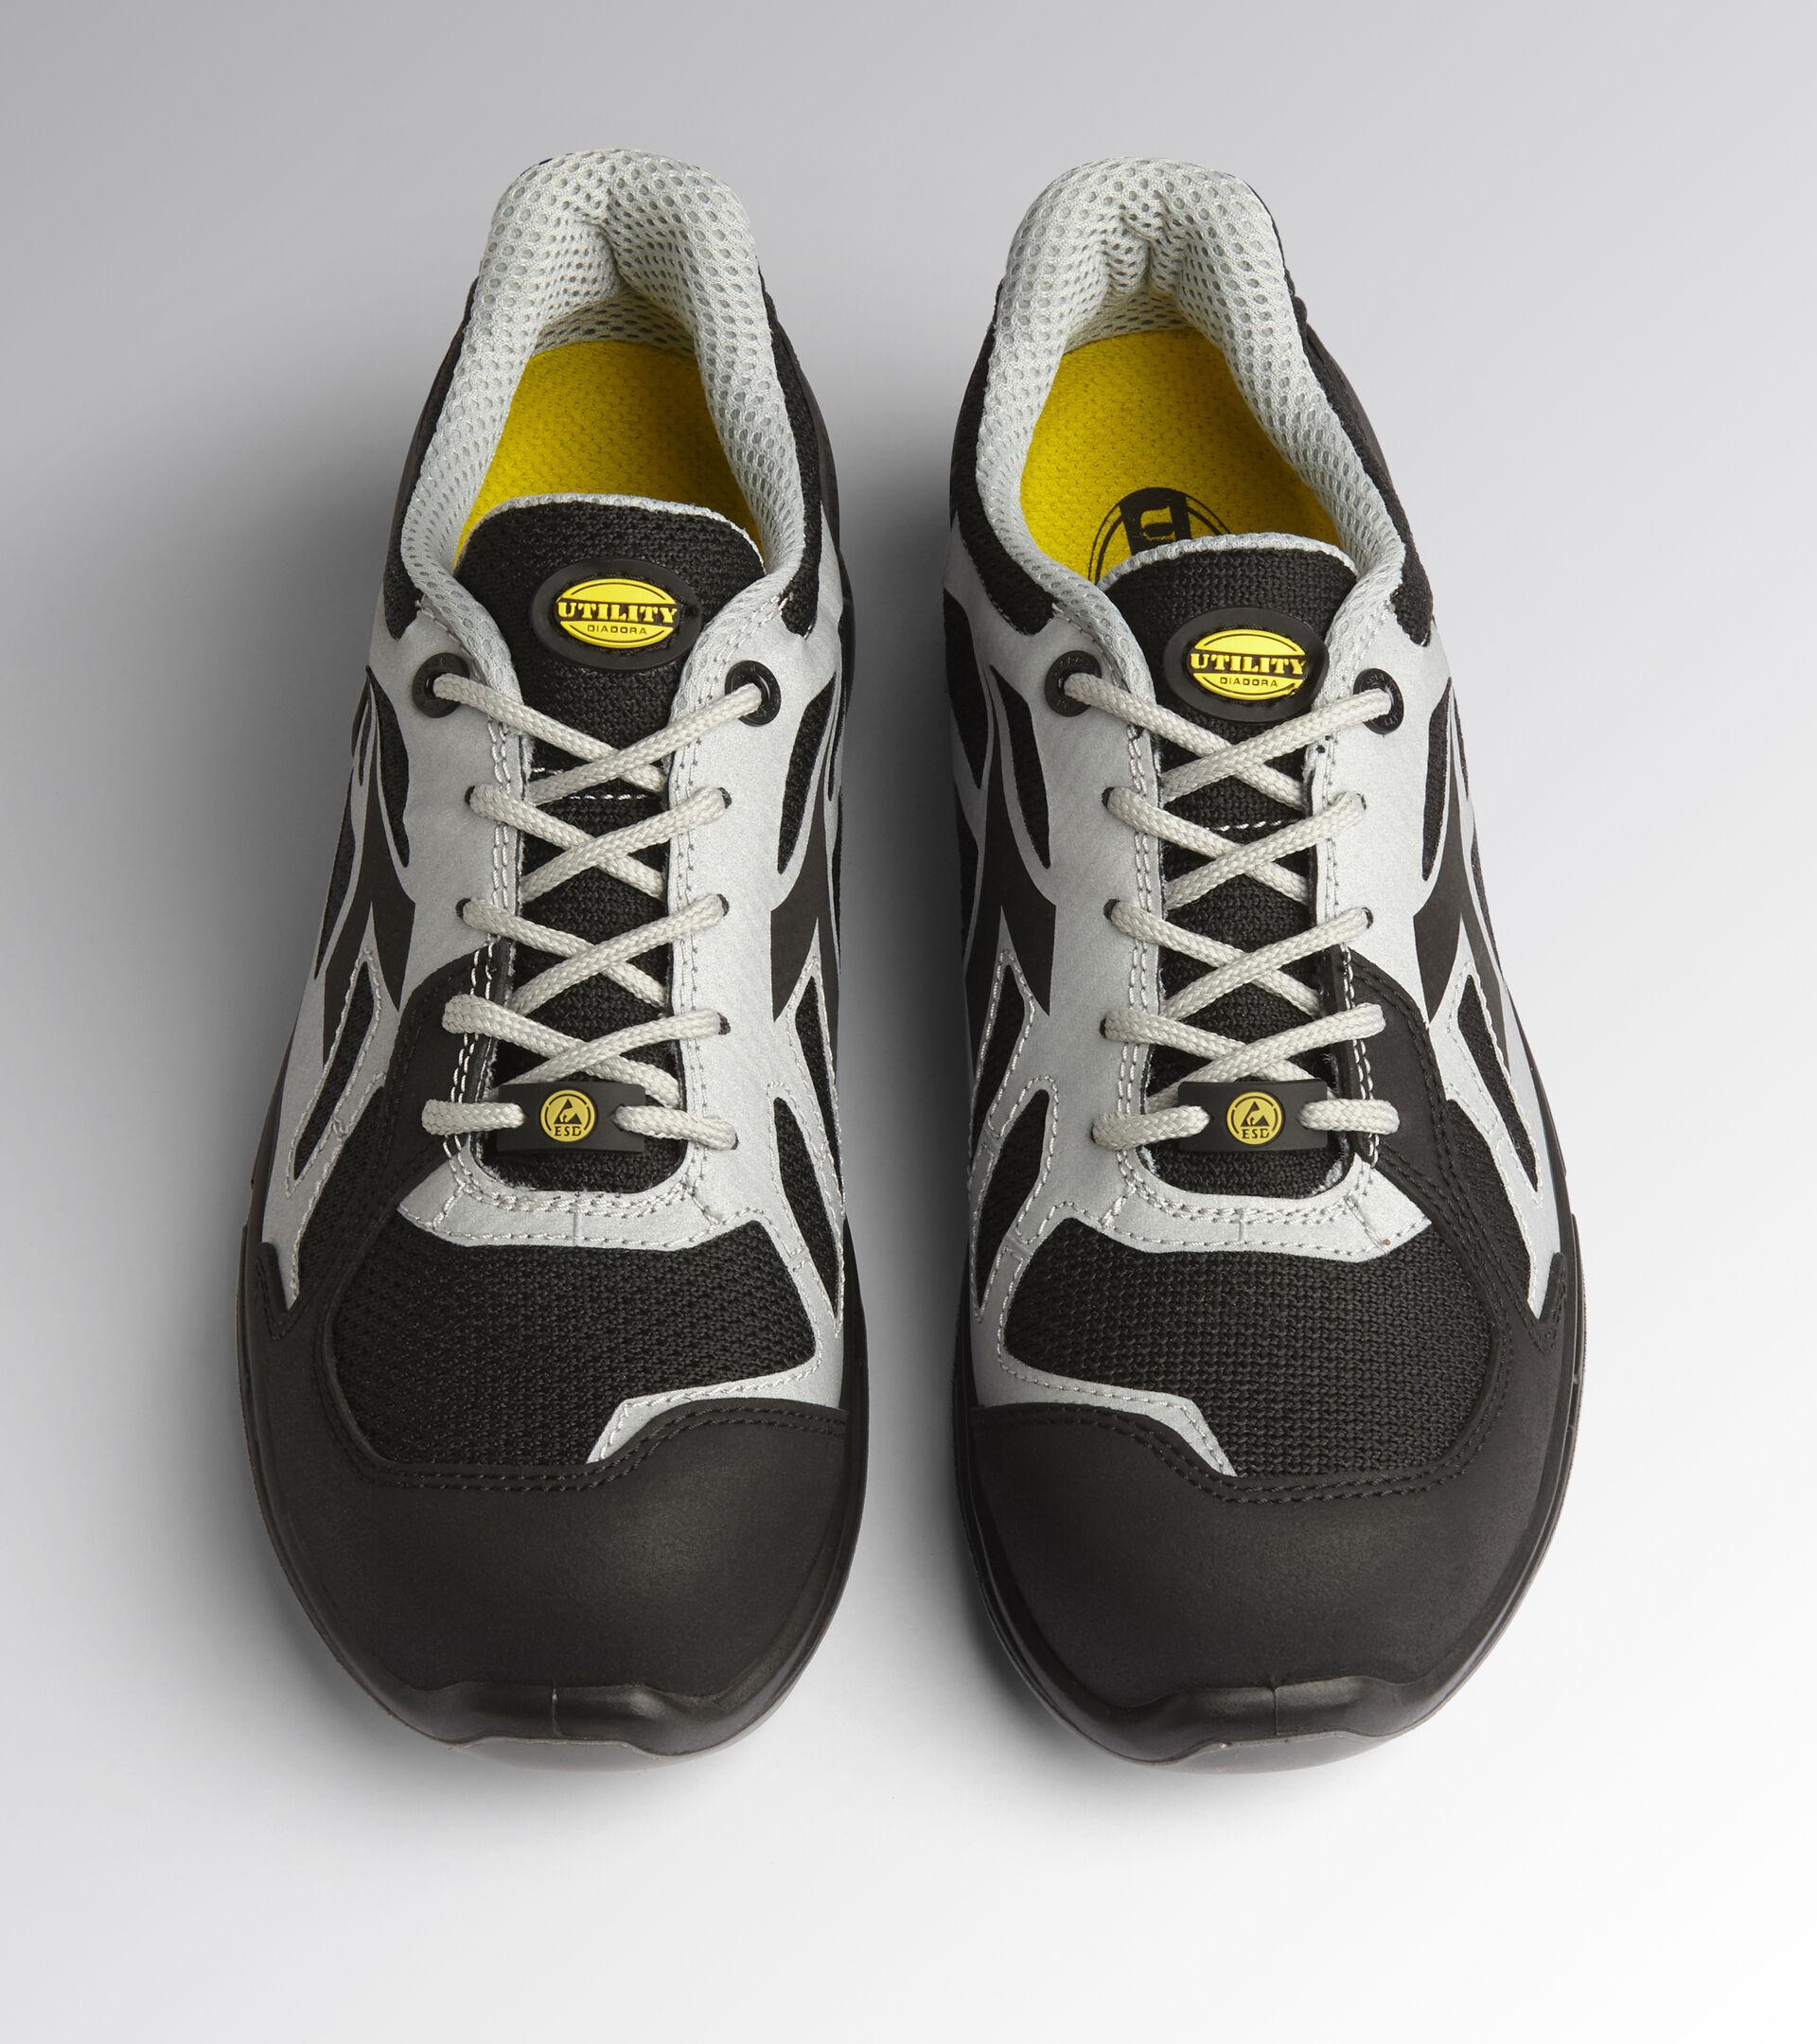 Footwear Utility UOMO FLEX LOW S1P SRC ESD BLACK Utility